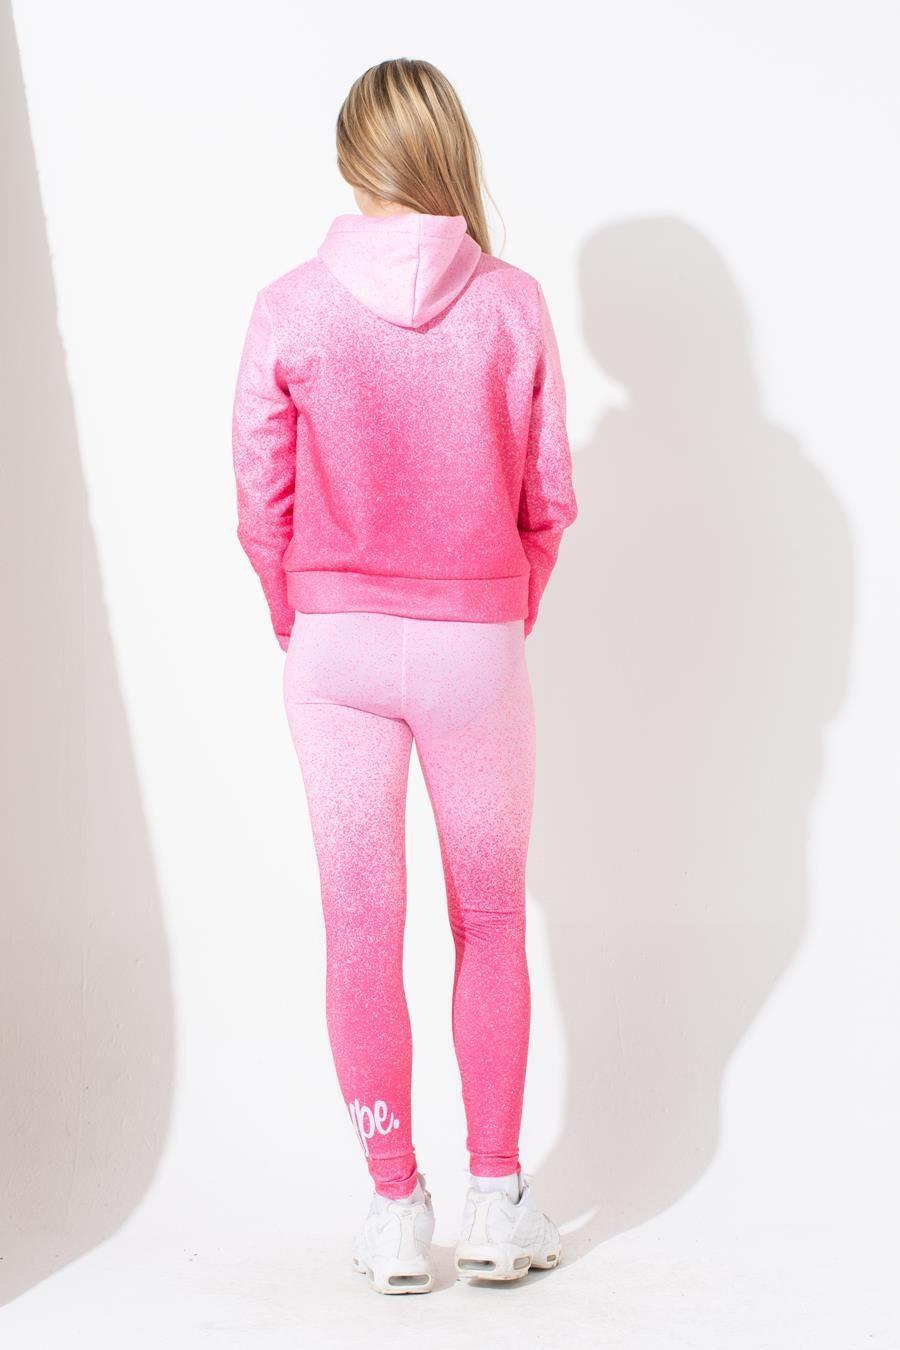 Hype Pink Speckle Fade Kids Crop Hoodie